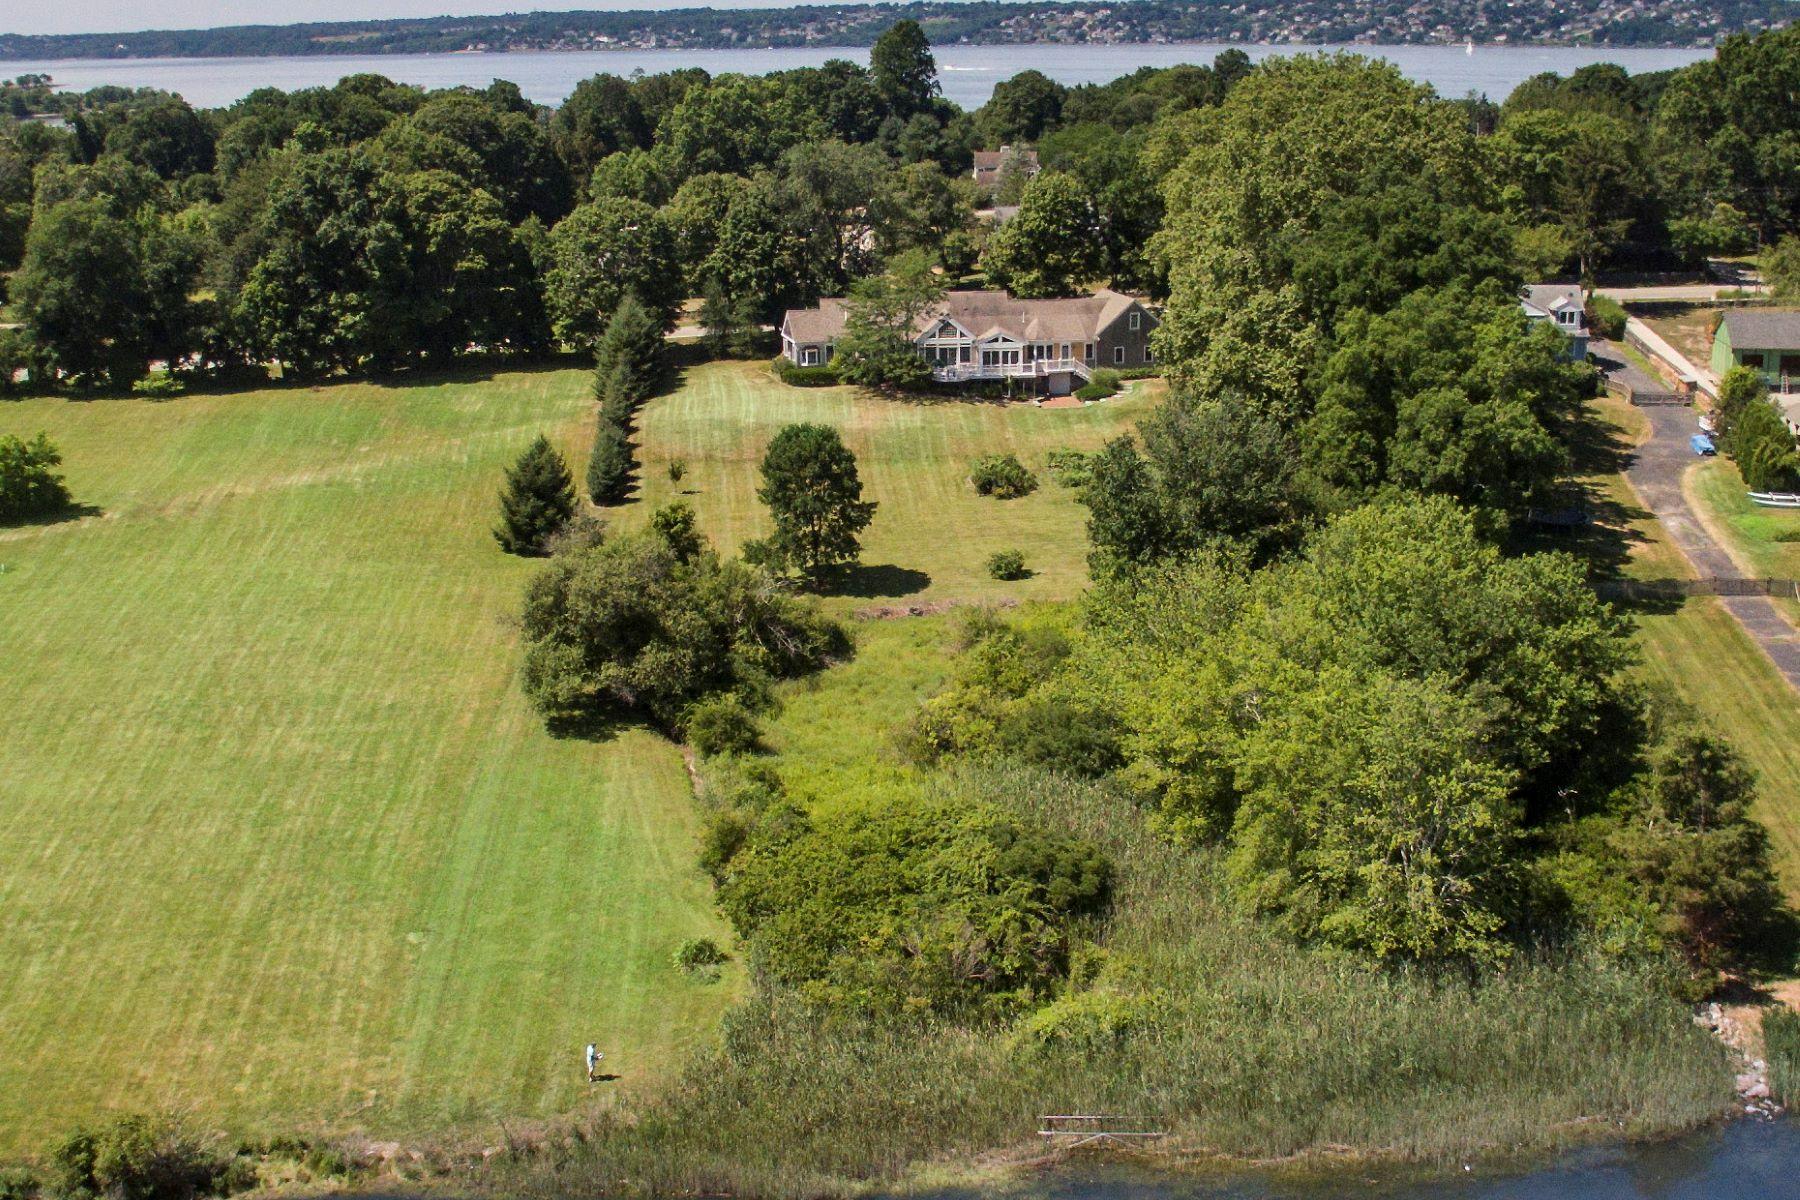 Single Family Home for Sale at Nanaquaket Cape 556 Nanaquaket Road Tiverton, Rhode Island 02878 United States